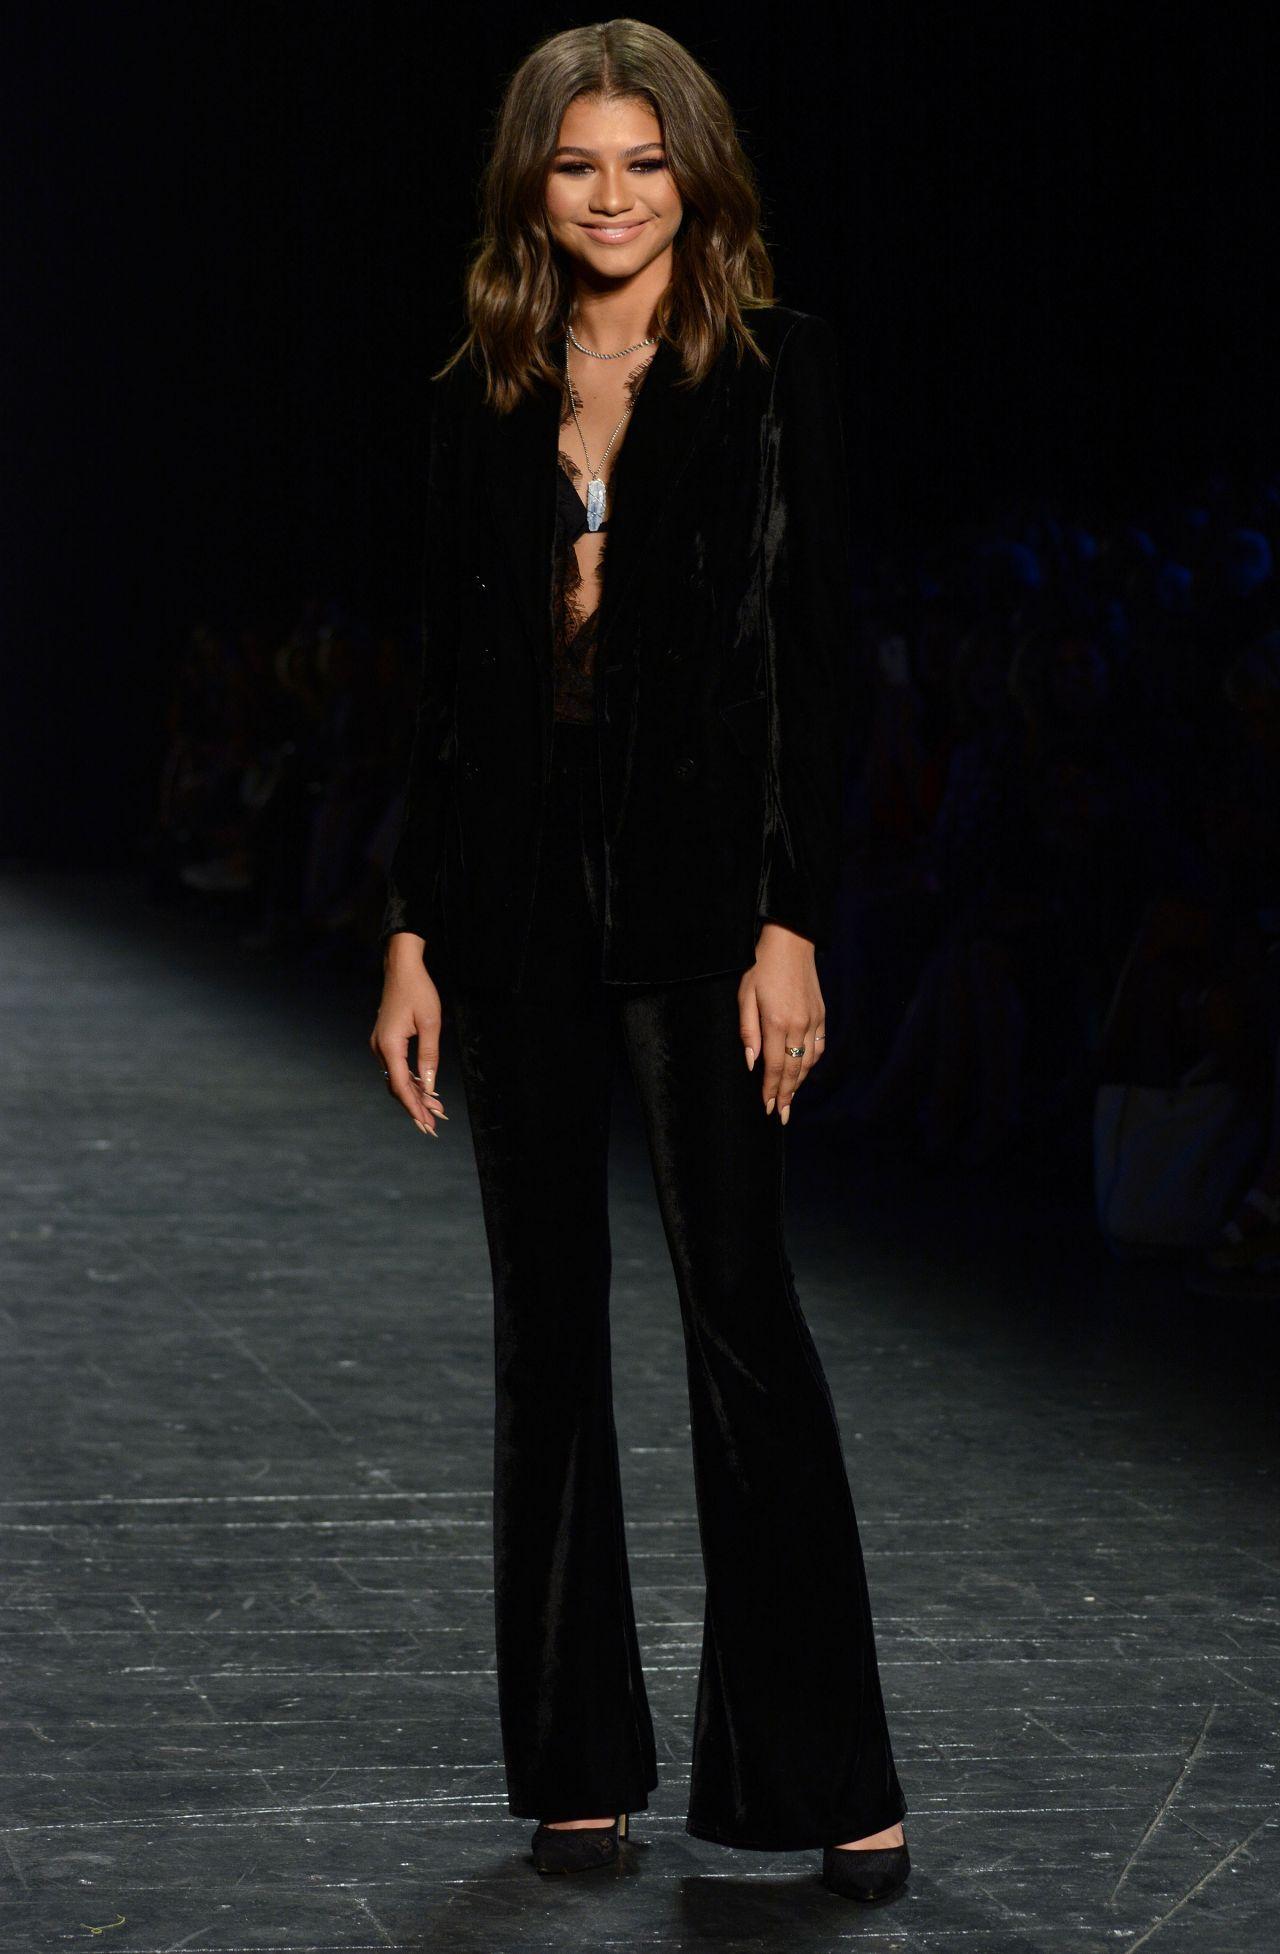 Zendaya Coleman Project Runway Fashion Show New York Fashion Week 9 9 2016